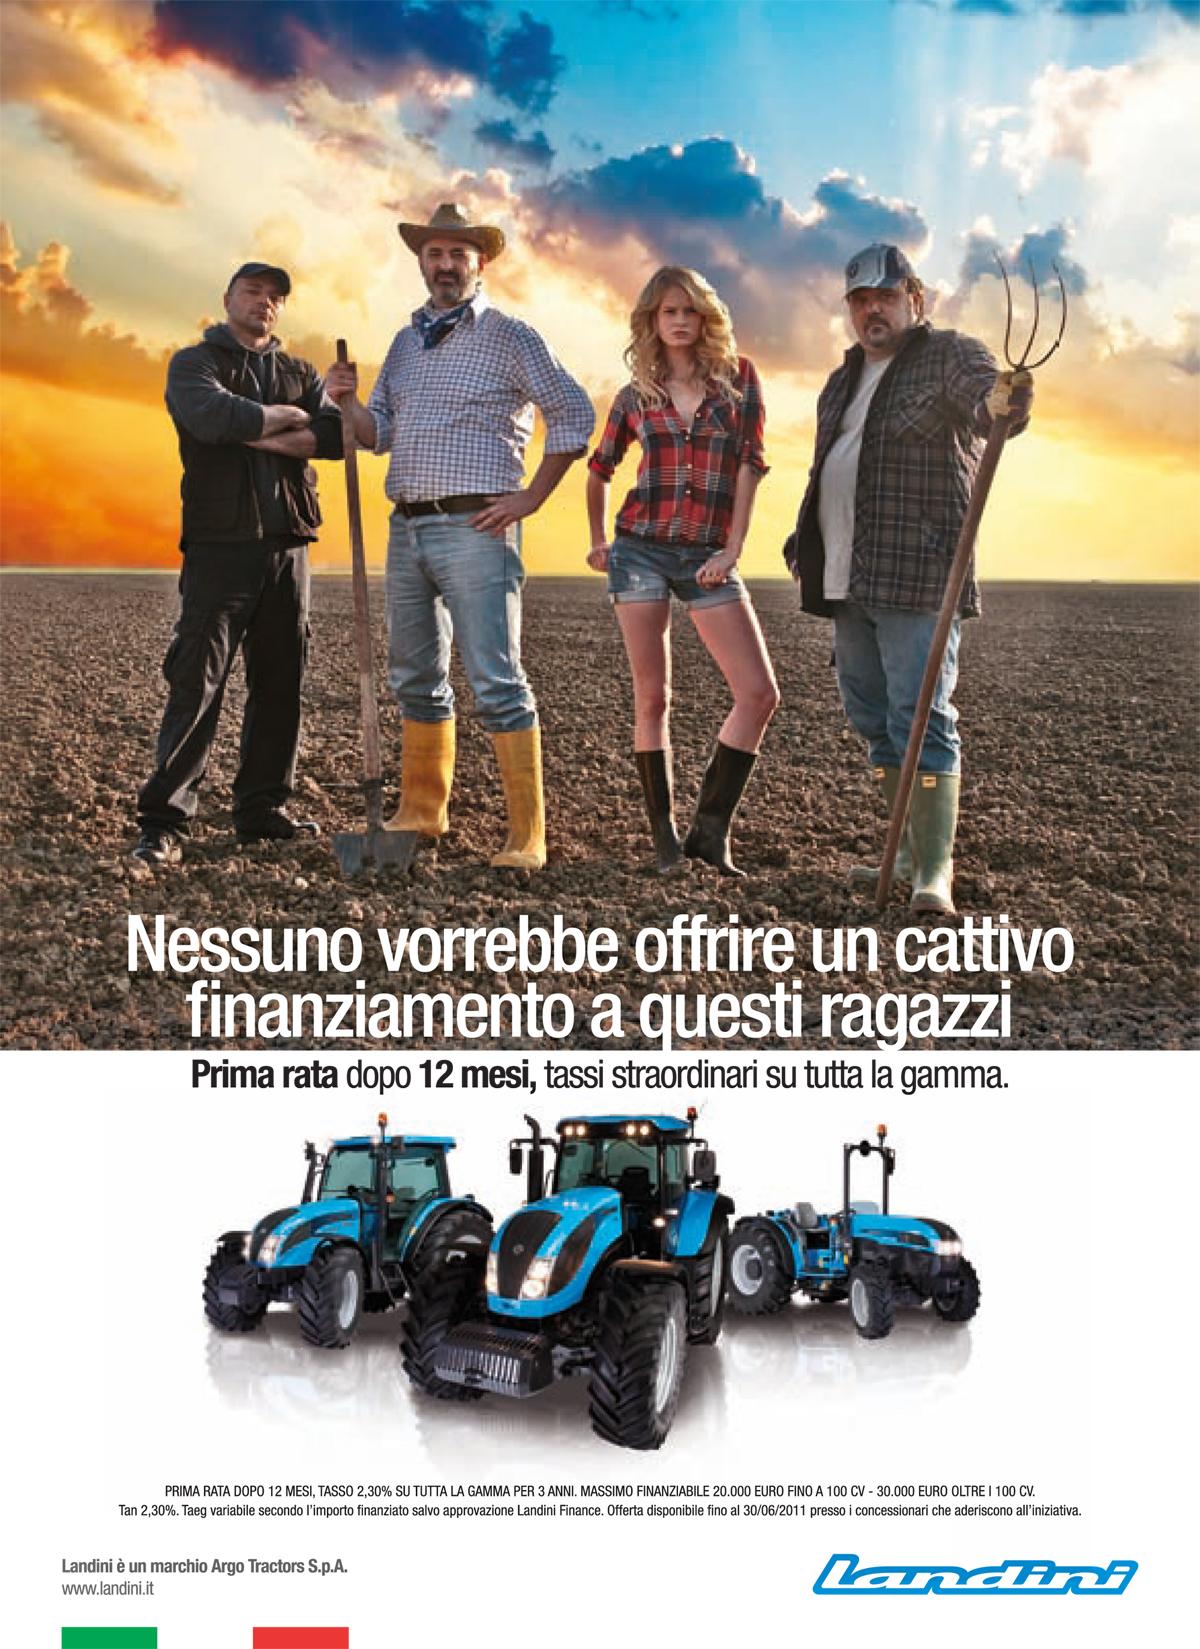 Landini e McCormick, campagna 2011 affidata a Arscolor Interactive e Qubic Communications